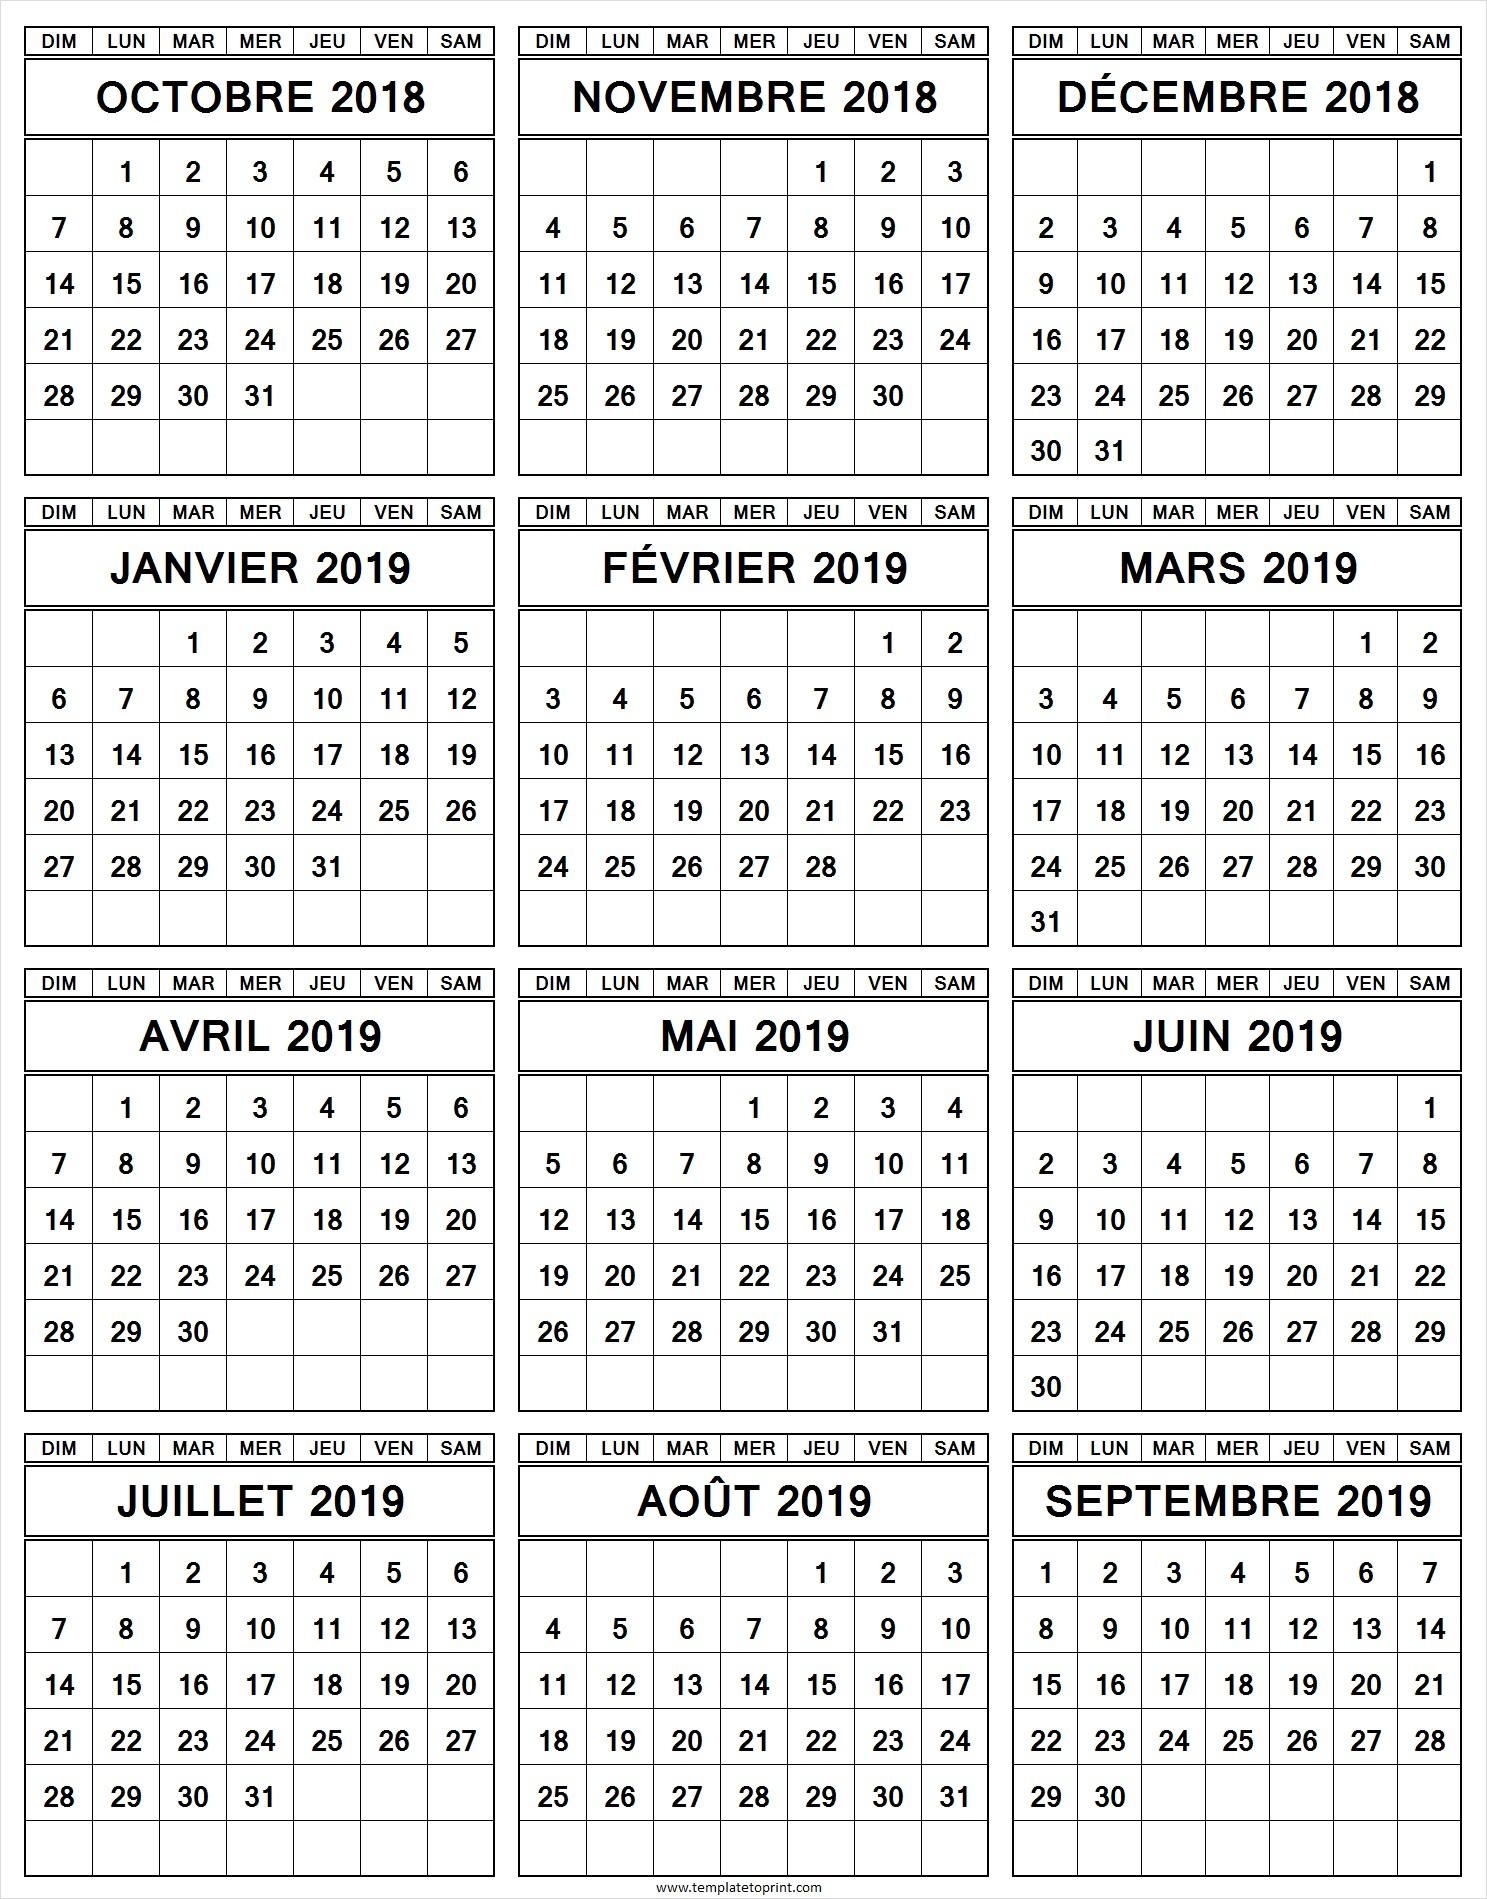 Calendrier Annuel Octobre 2018 A Septembre 2019 Imprimer dedans Calendrier Annuel 2018 À Imprimer